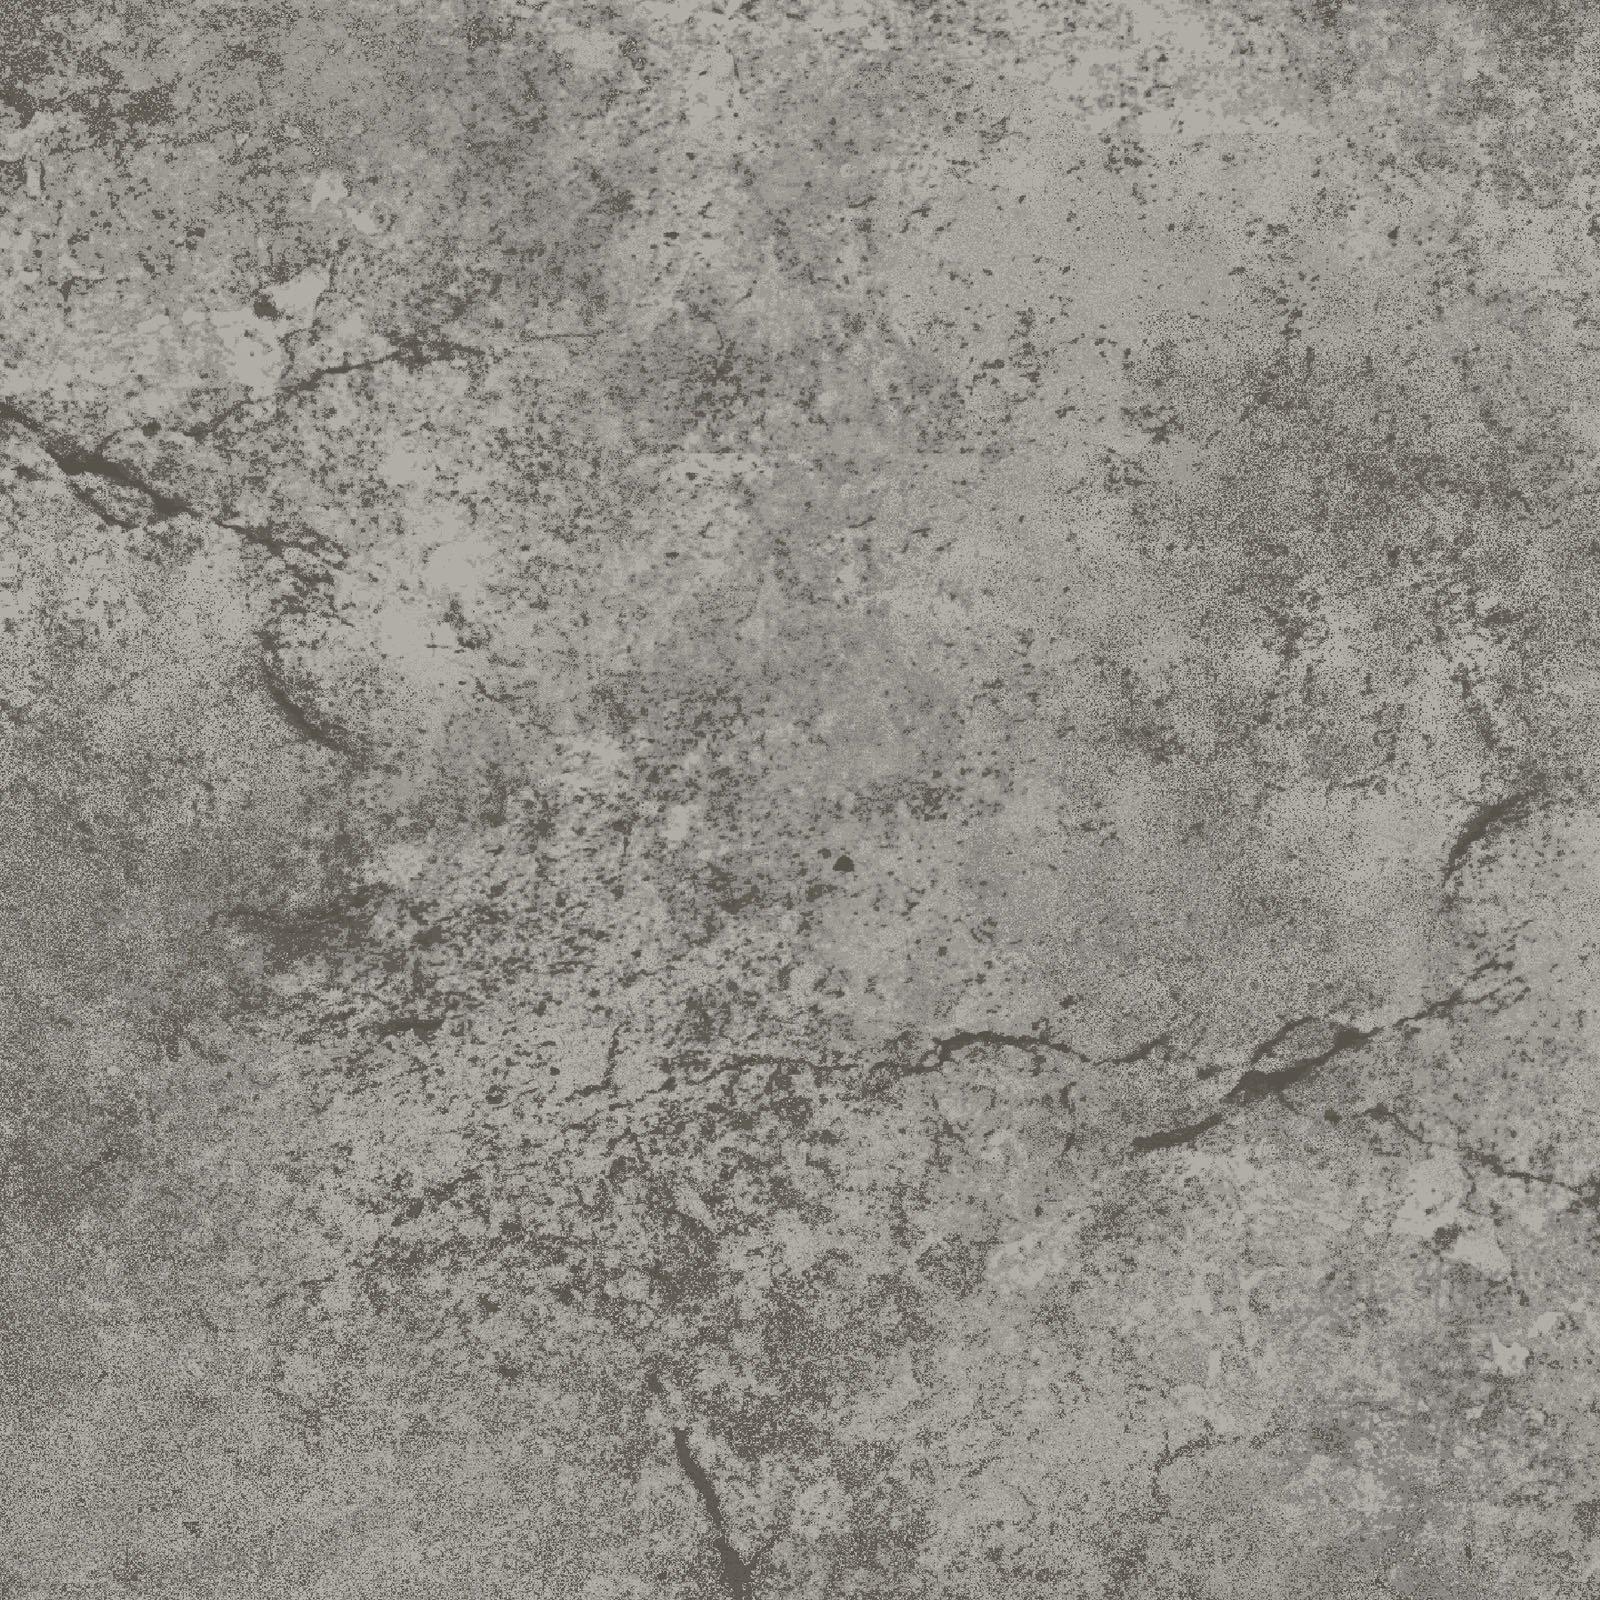 High Country Crossing - Granite - Stone - Maywood Studio - 714329362823 - 1533254733